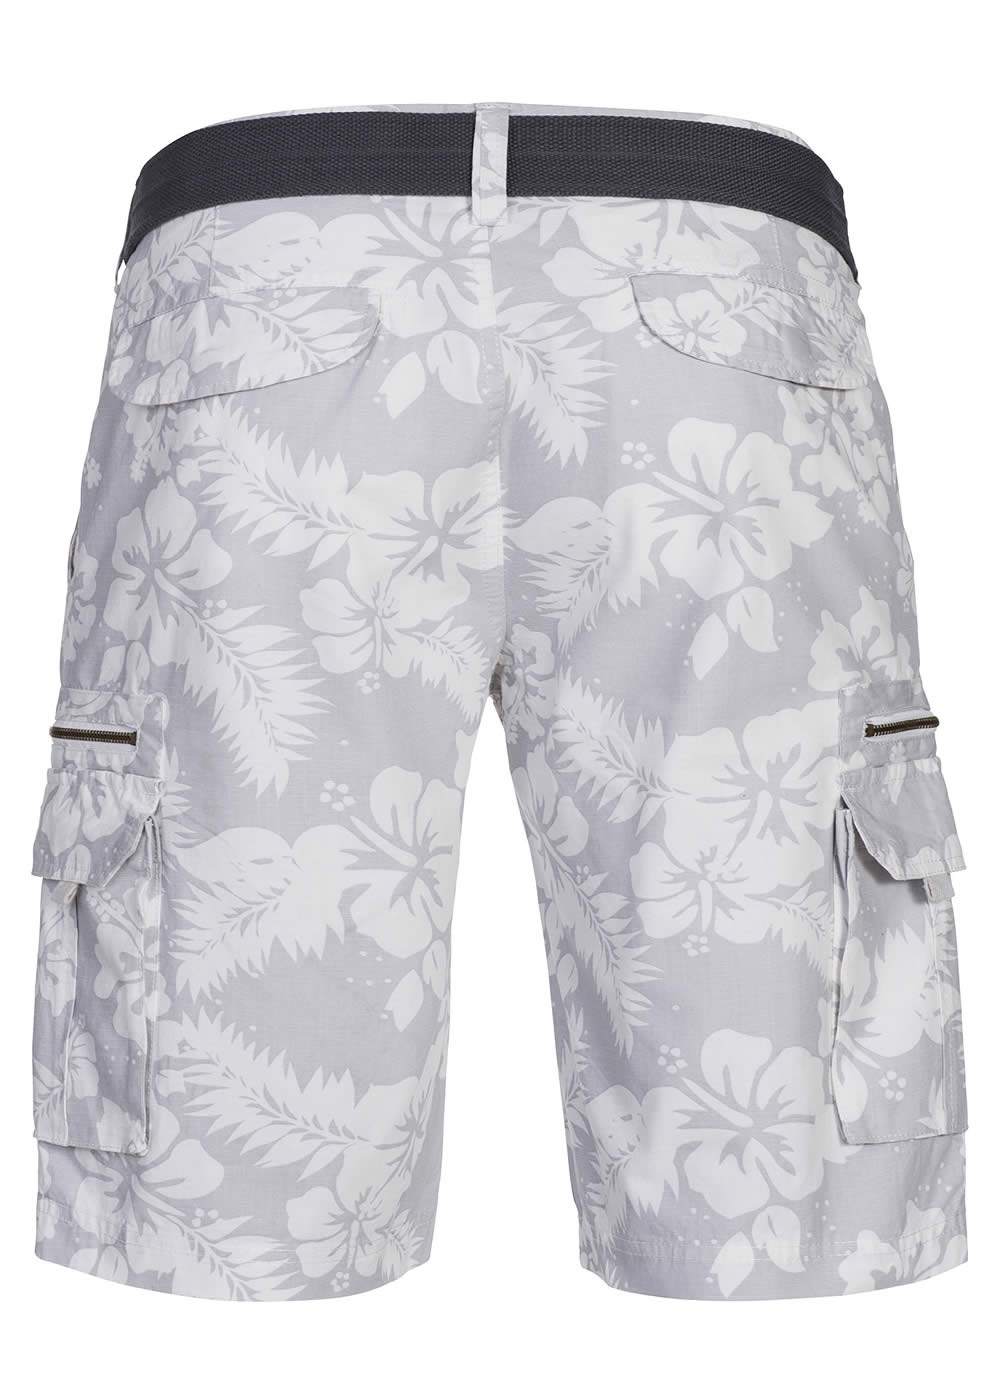 Shop hawaii online